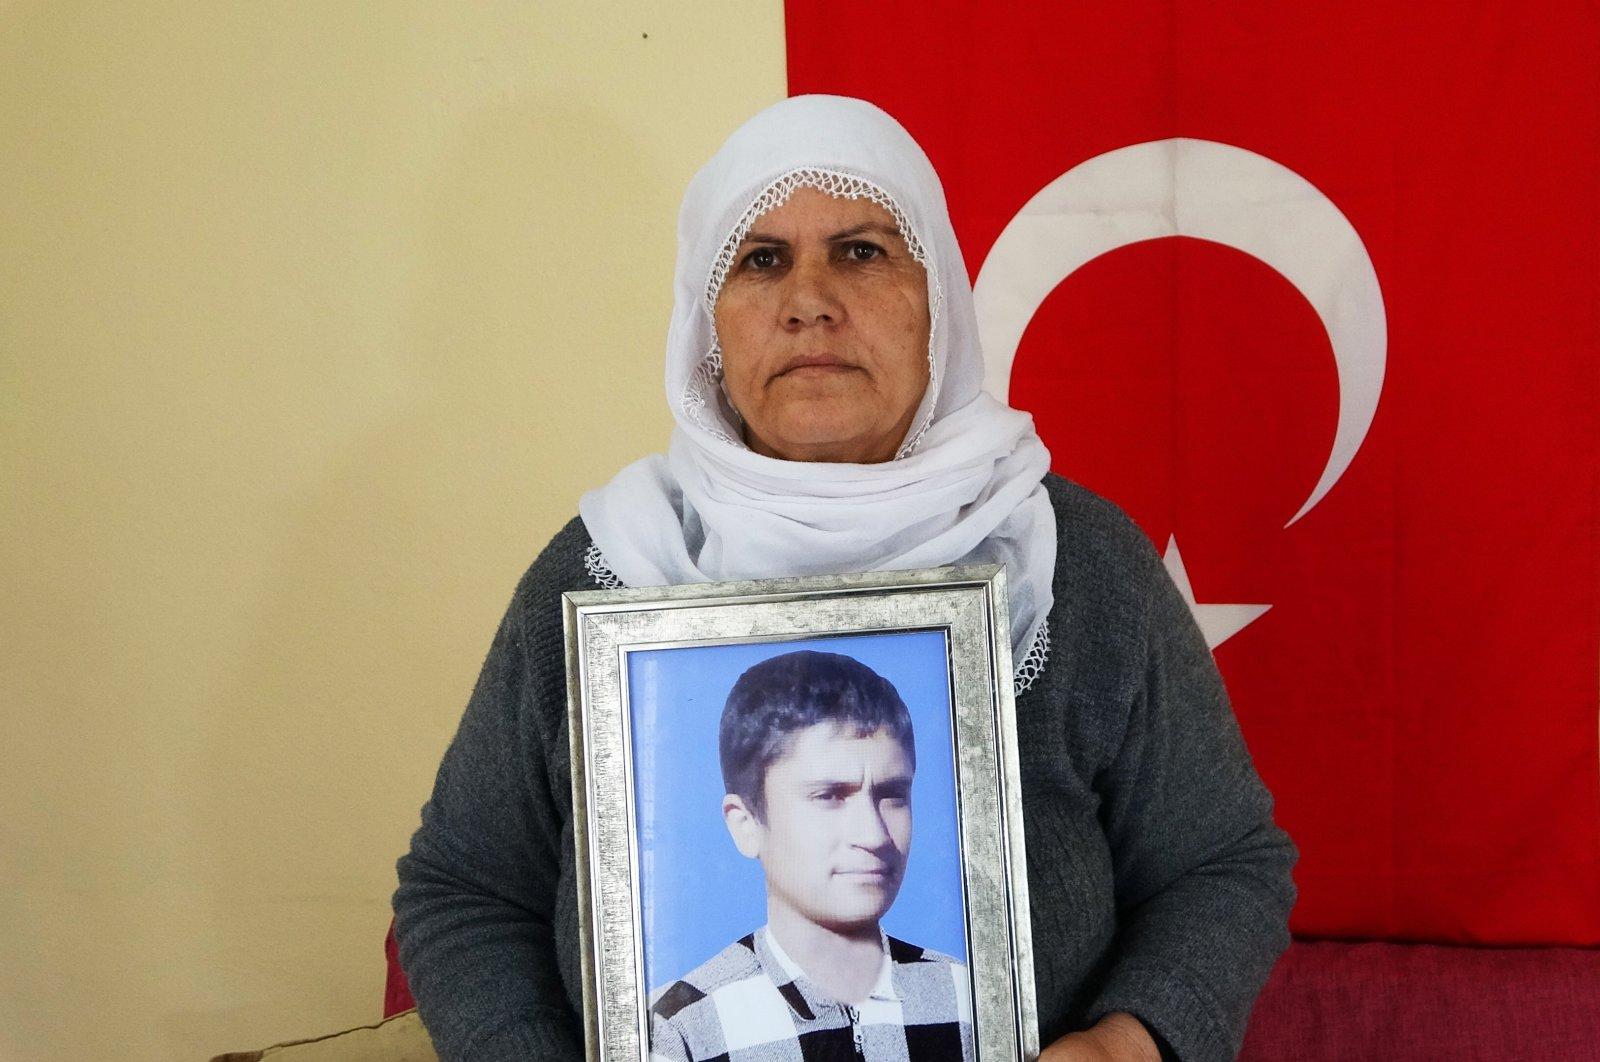 Naciye Sönmez Yıldız holds photo of her son abducted by the PKK in Muş, Turkey, Monday, Oct. 4, 2021. (IHA Photo)